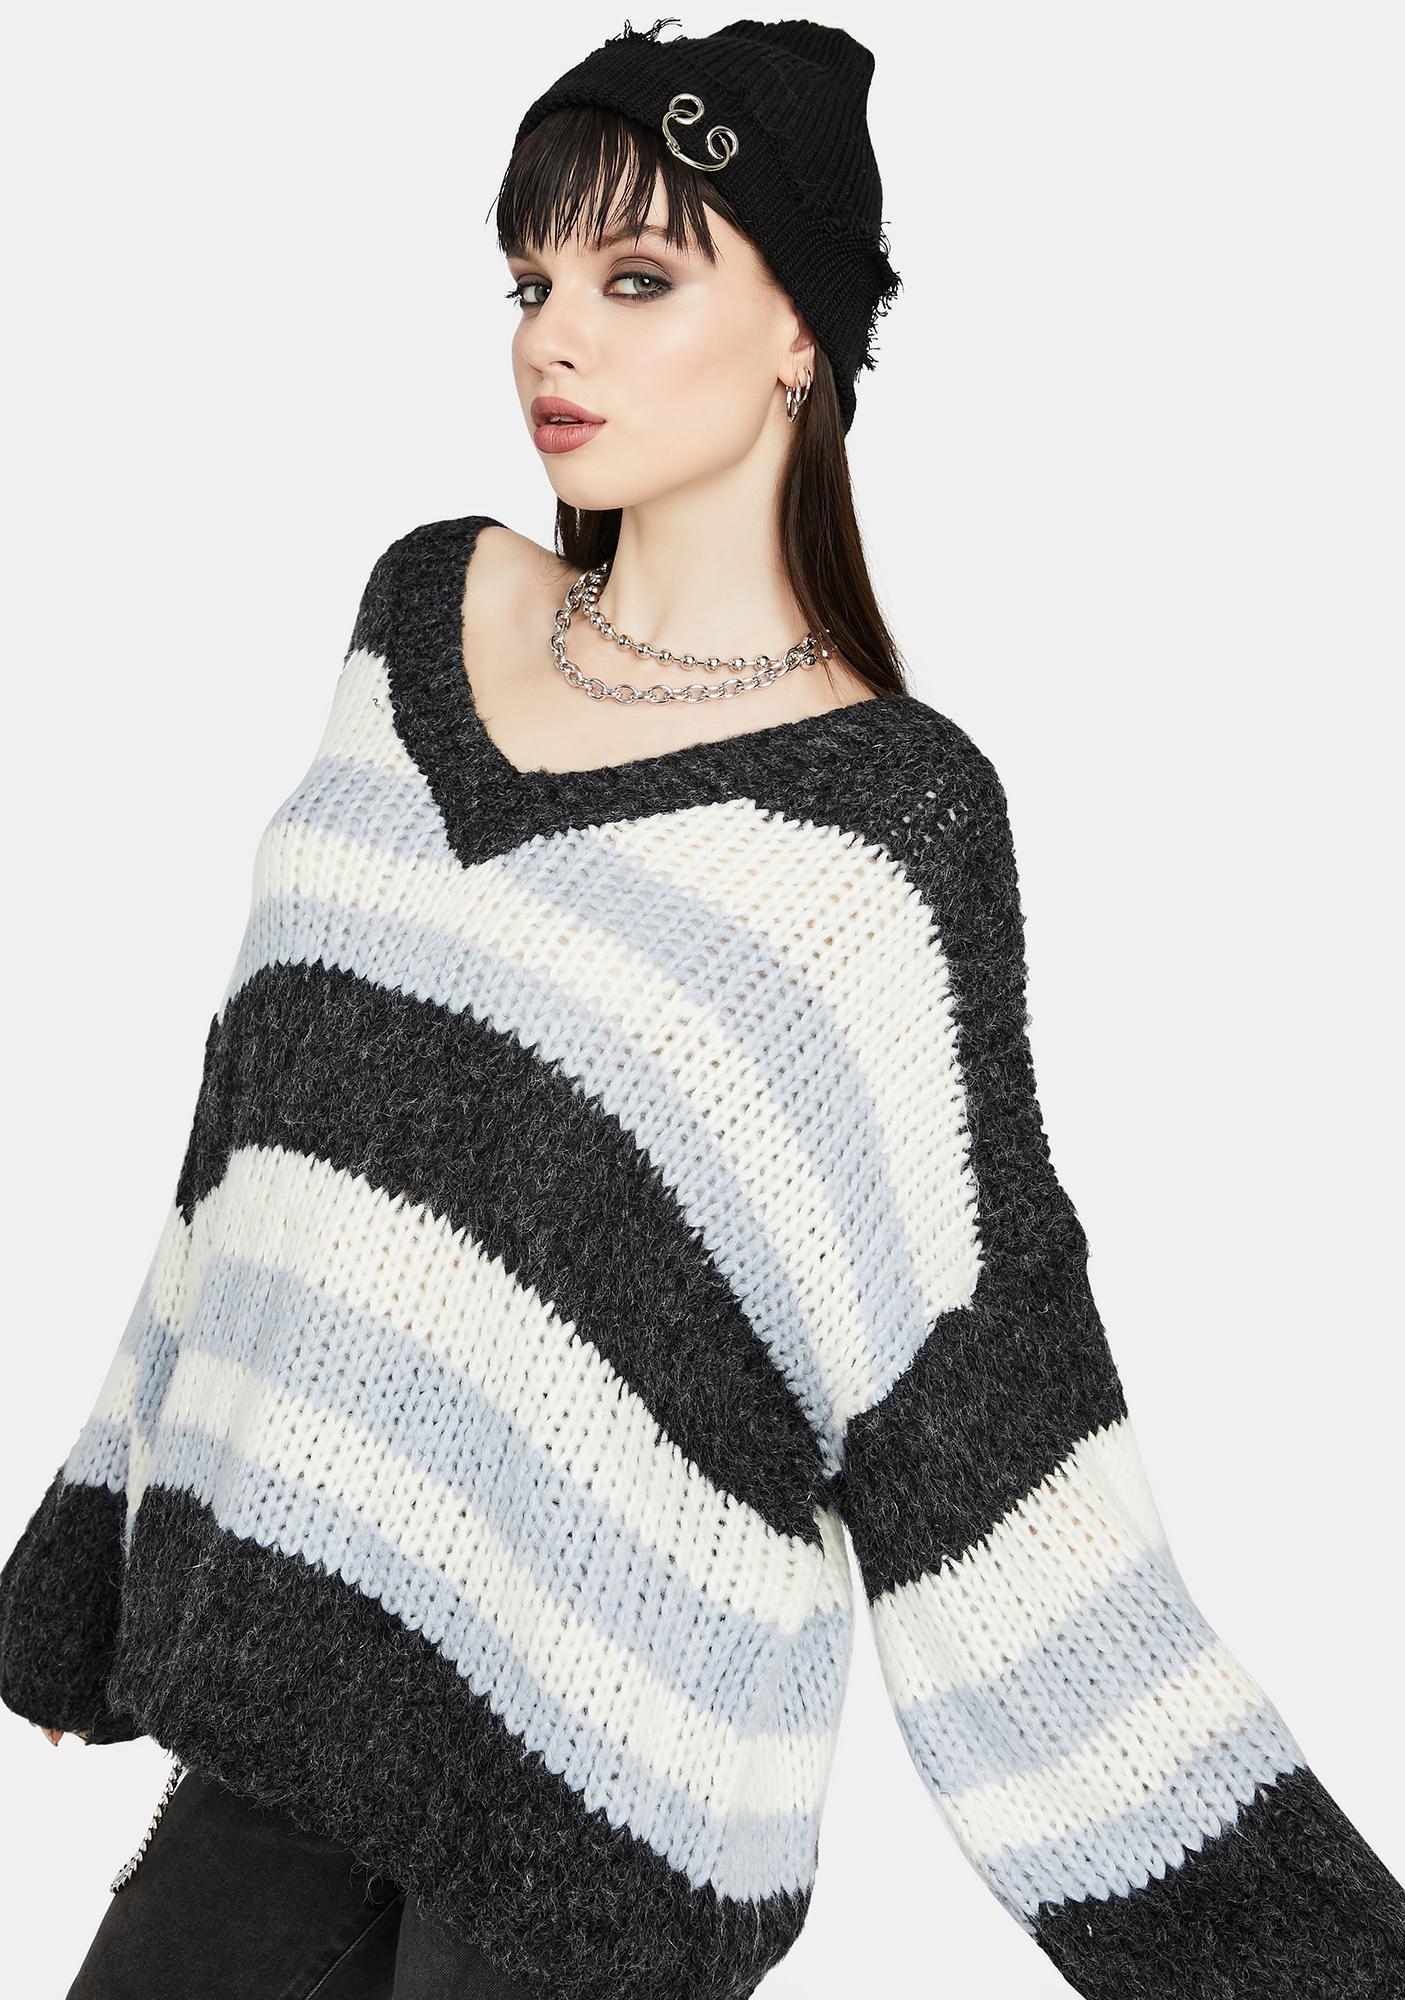 Charcoal Sage Serenity V-Neck Sweater